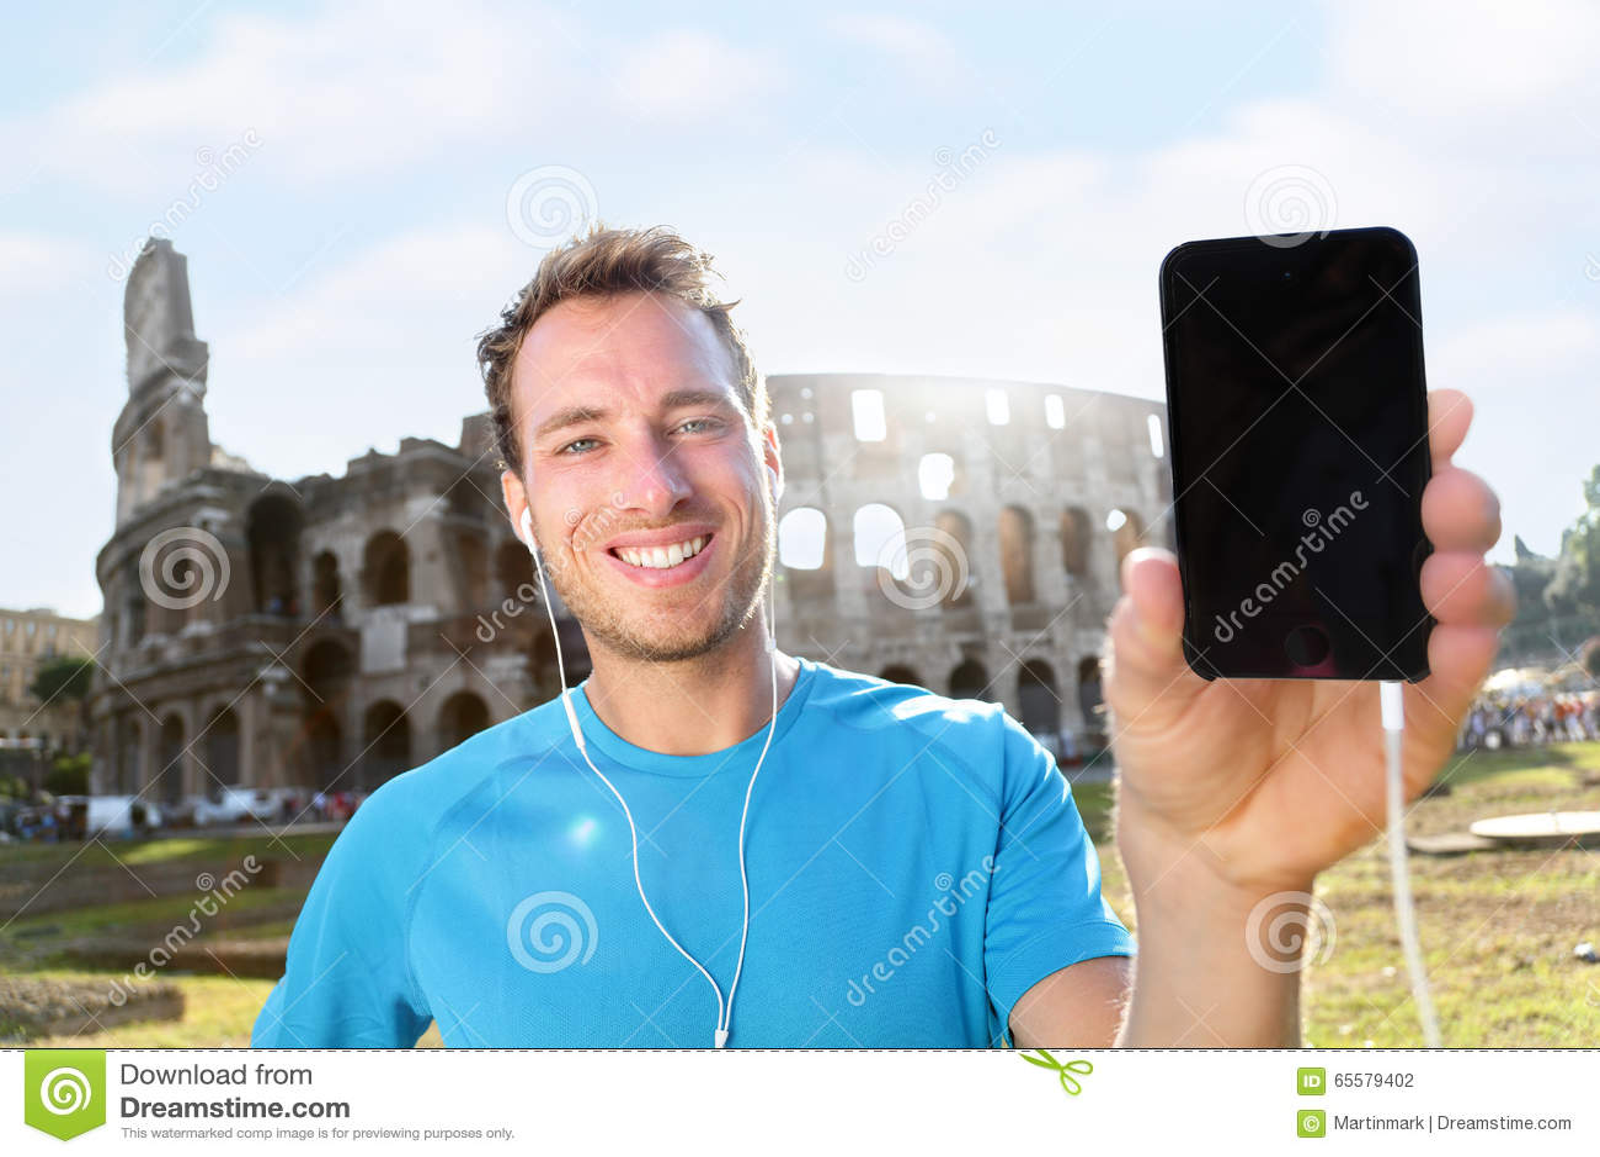 Basculador de sorriso que mostra Smartphone contra Colosseum